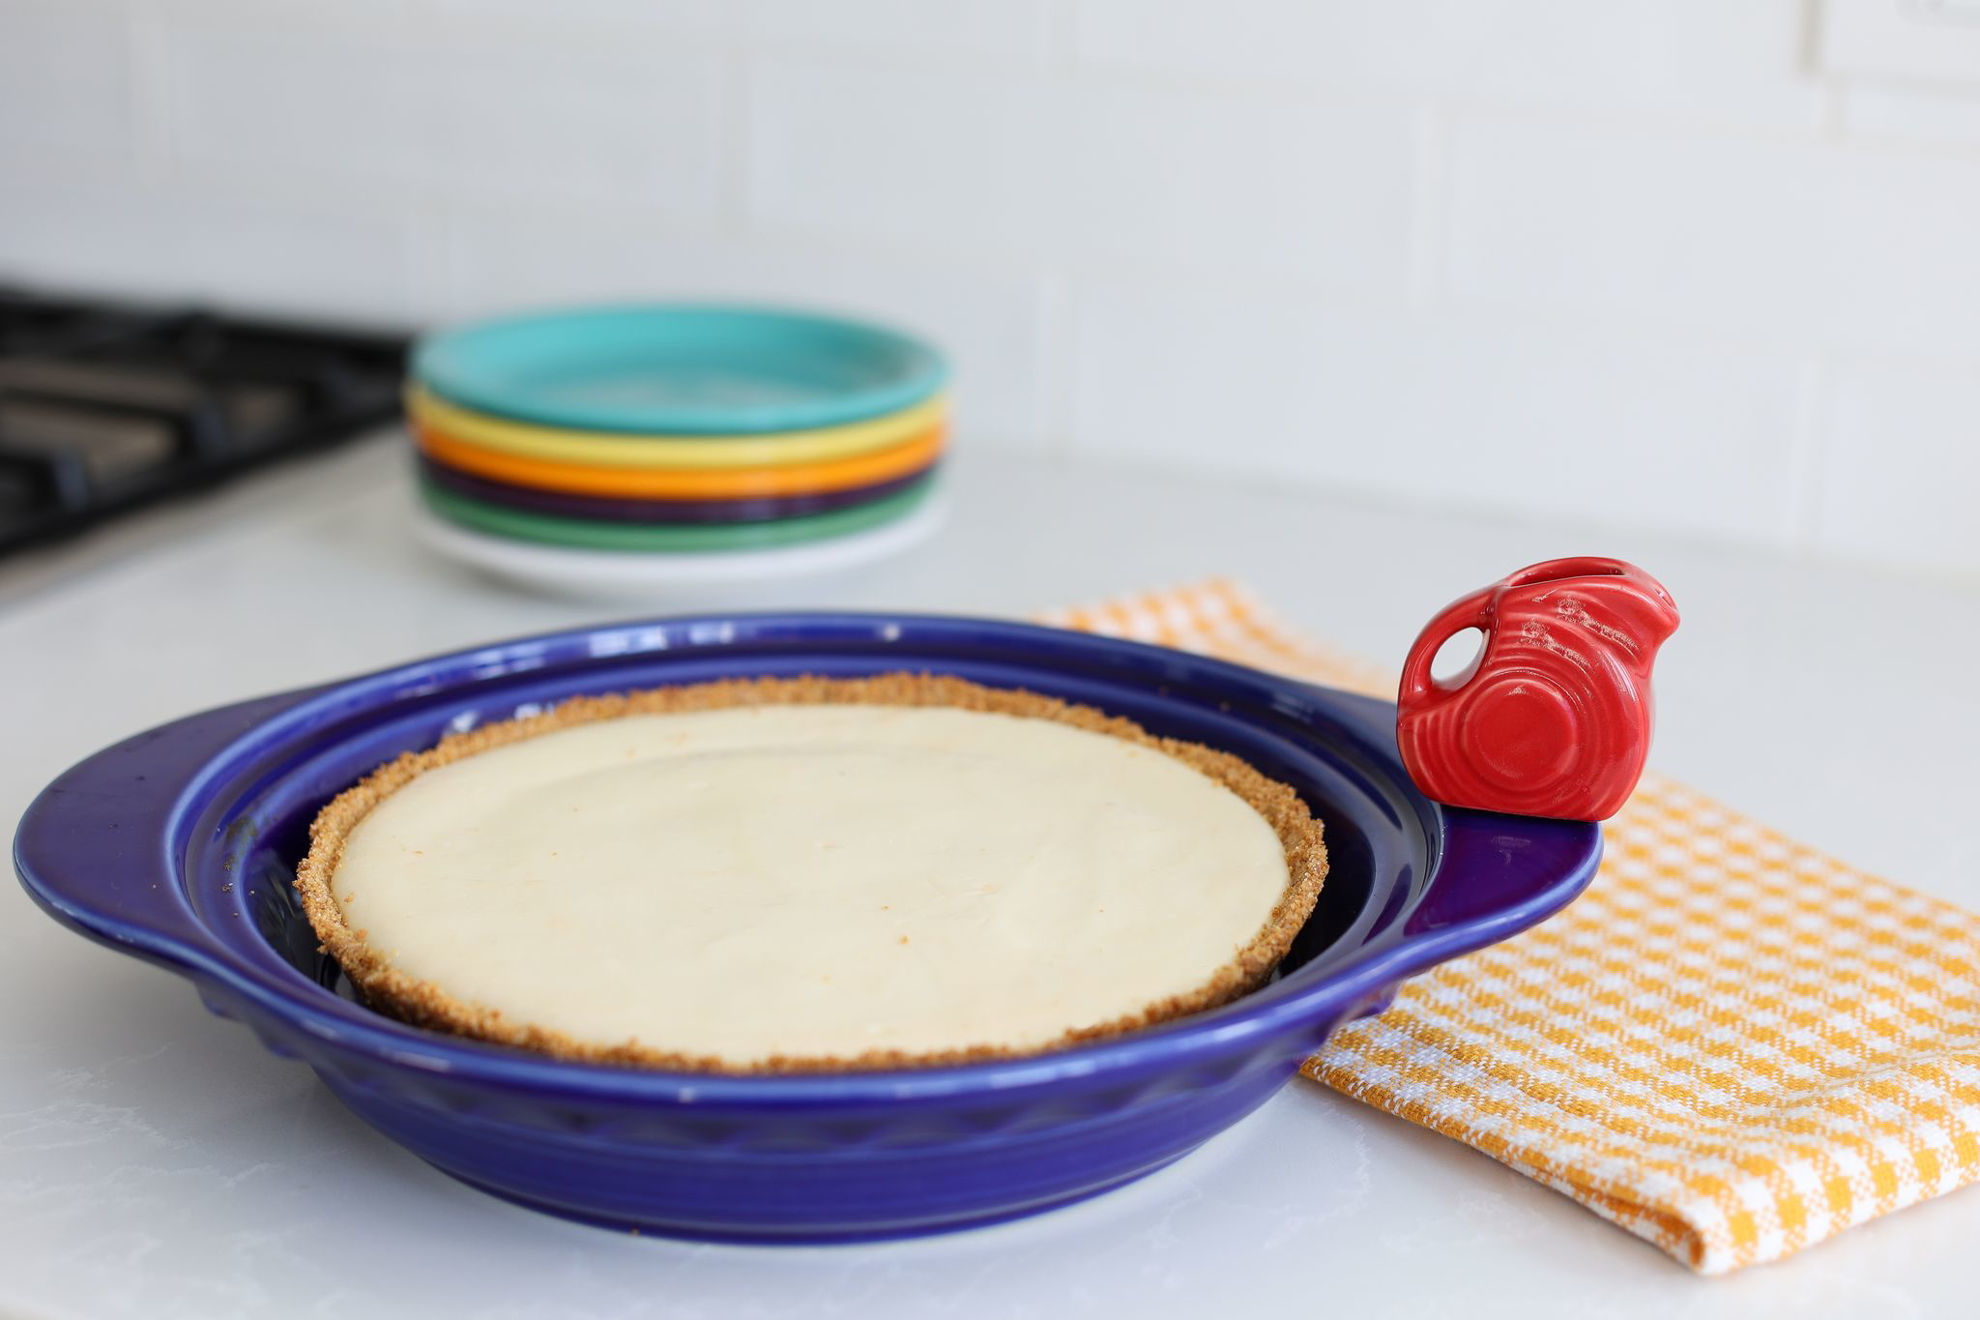 Fiesta Pie Pan with Mini Set by Nora Fleming